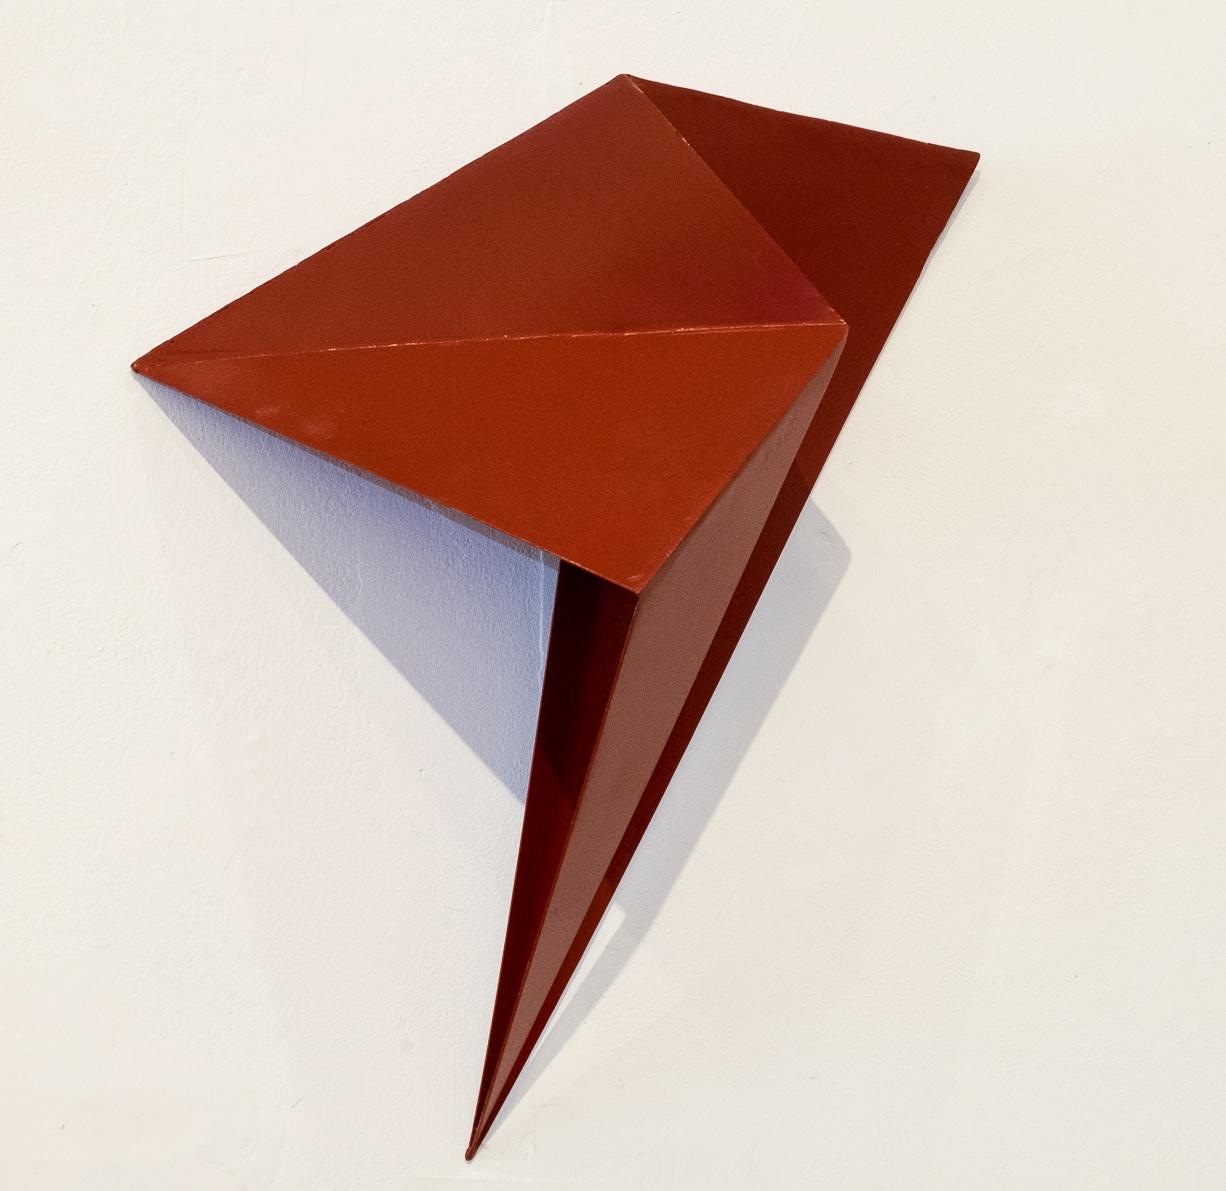 Triangle 59